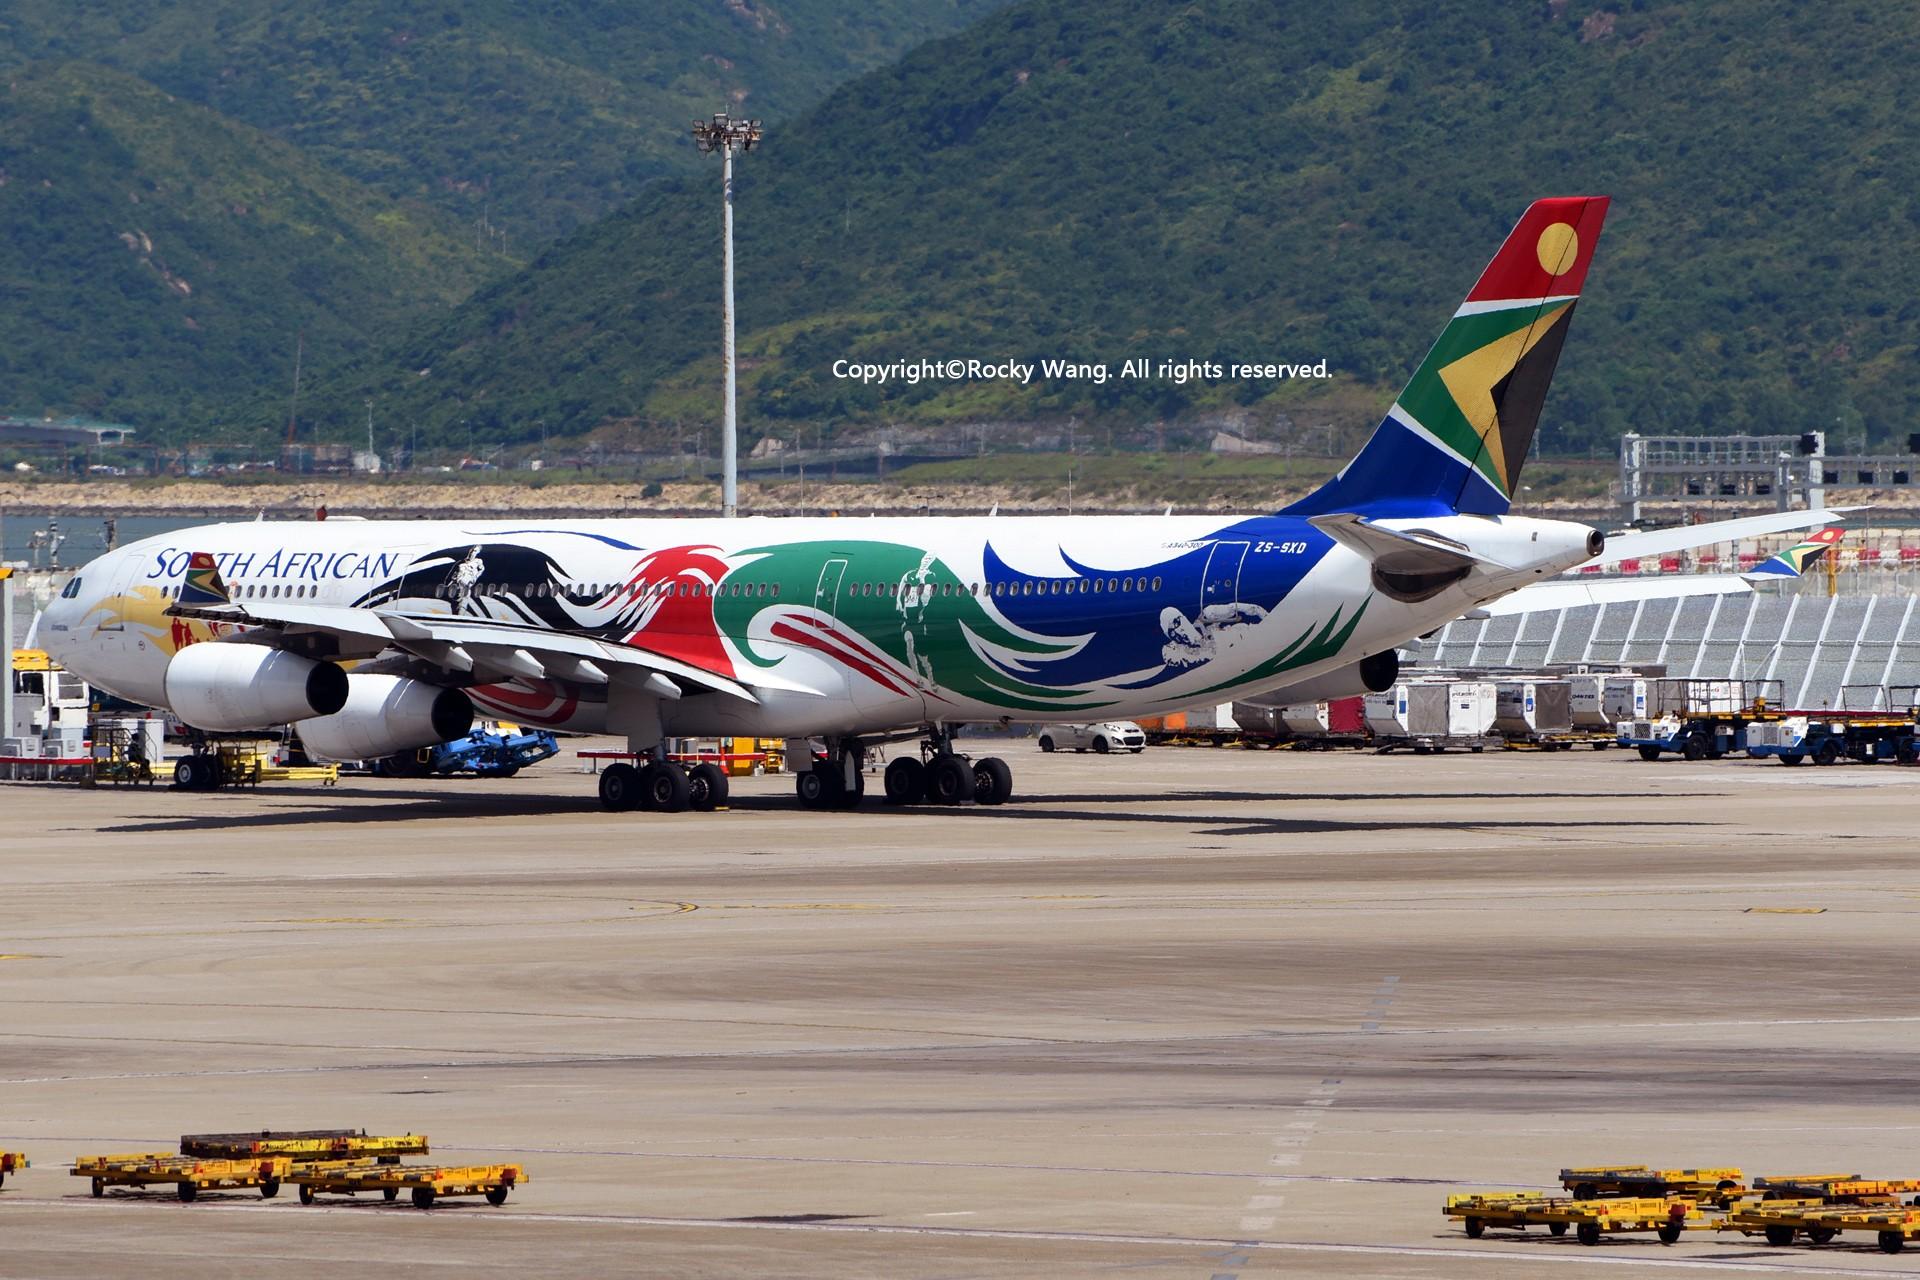 Re:[原创]简易版游记,纪念一次30段的环球飞行和一些碎碎念 AIRBUS A340-313E ZS-SXD Hong Kong-Chek Lap Kok Int'l Airport